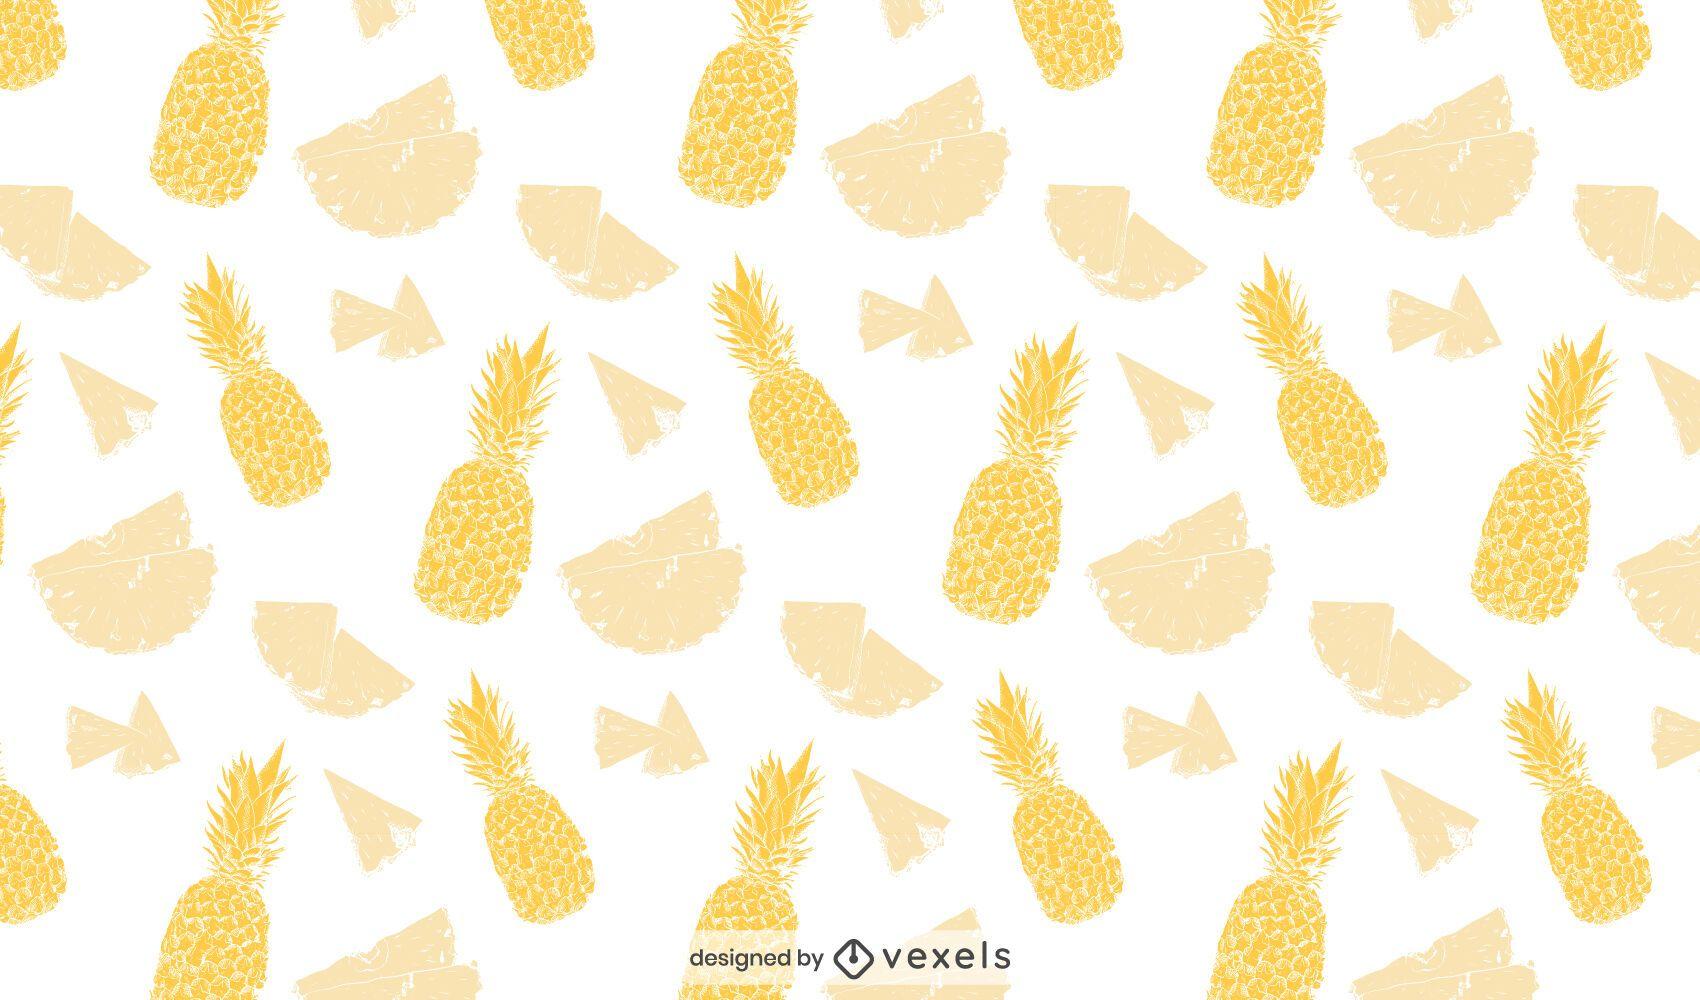 Yellow pineapple pattern design